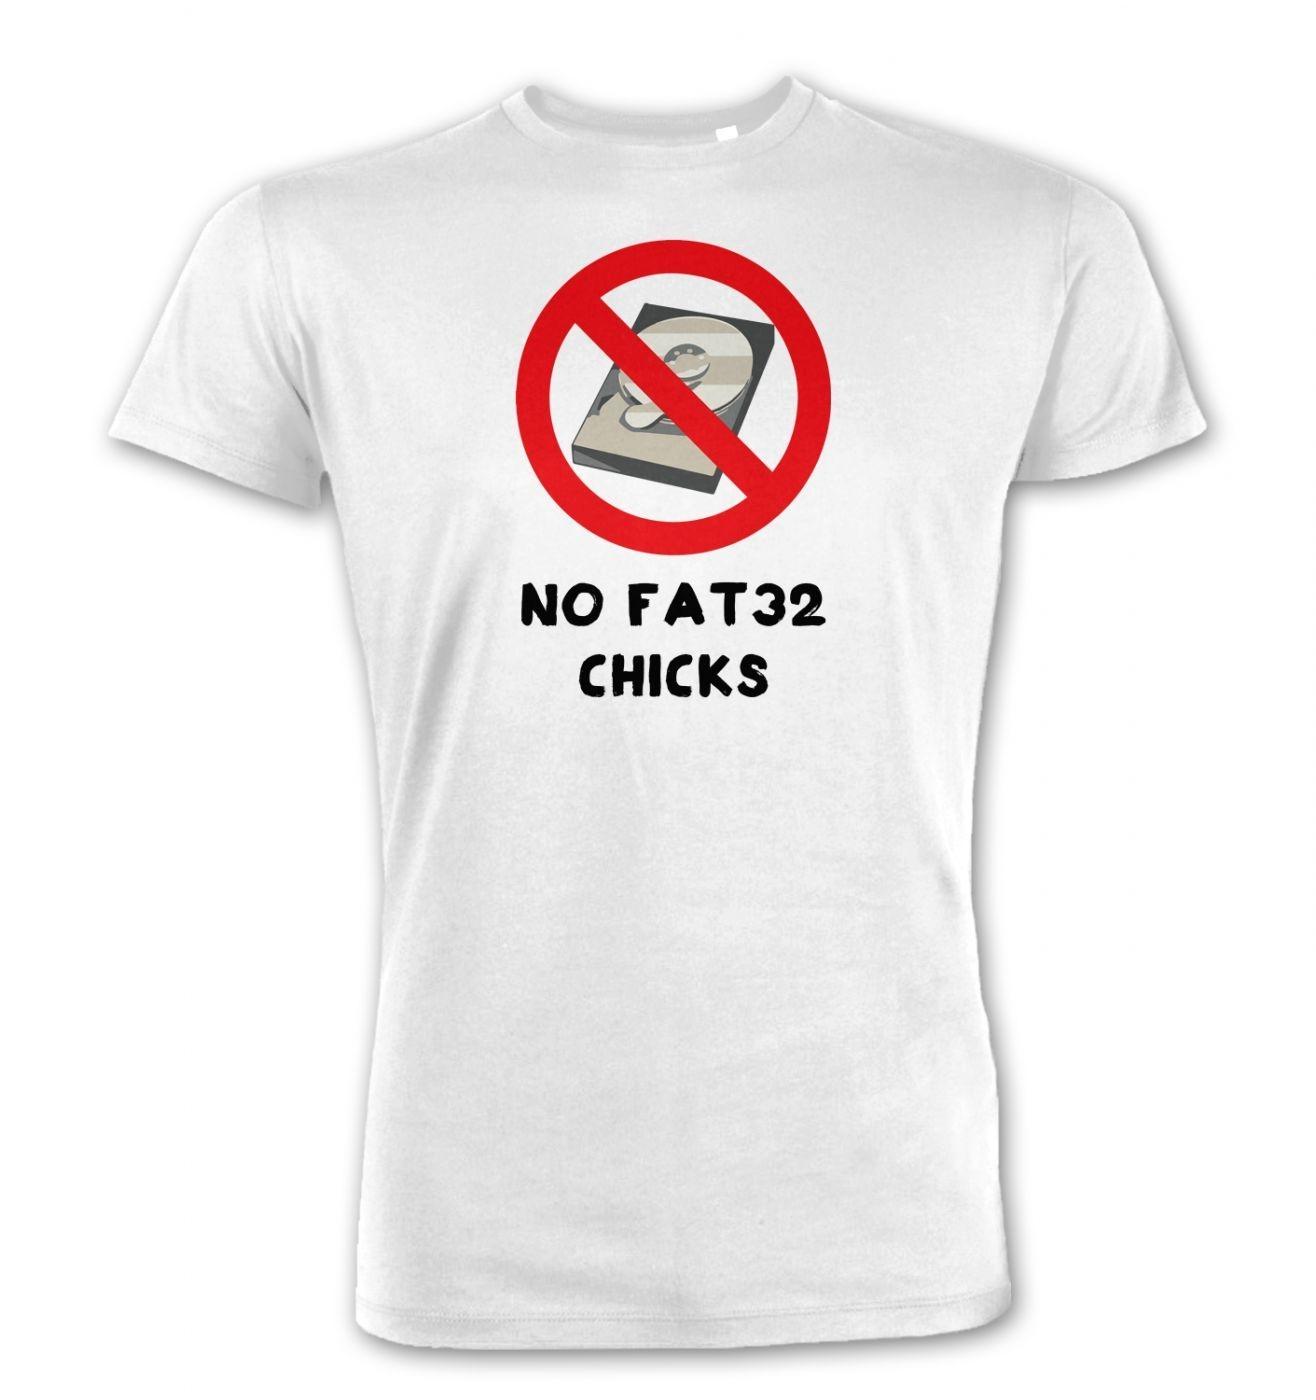 No FAT32 Chicks Premium t-shirt